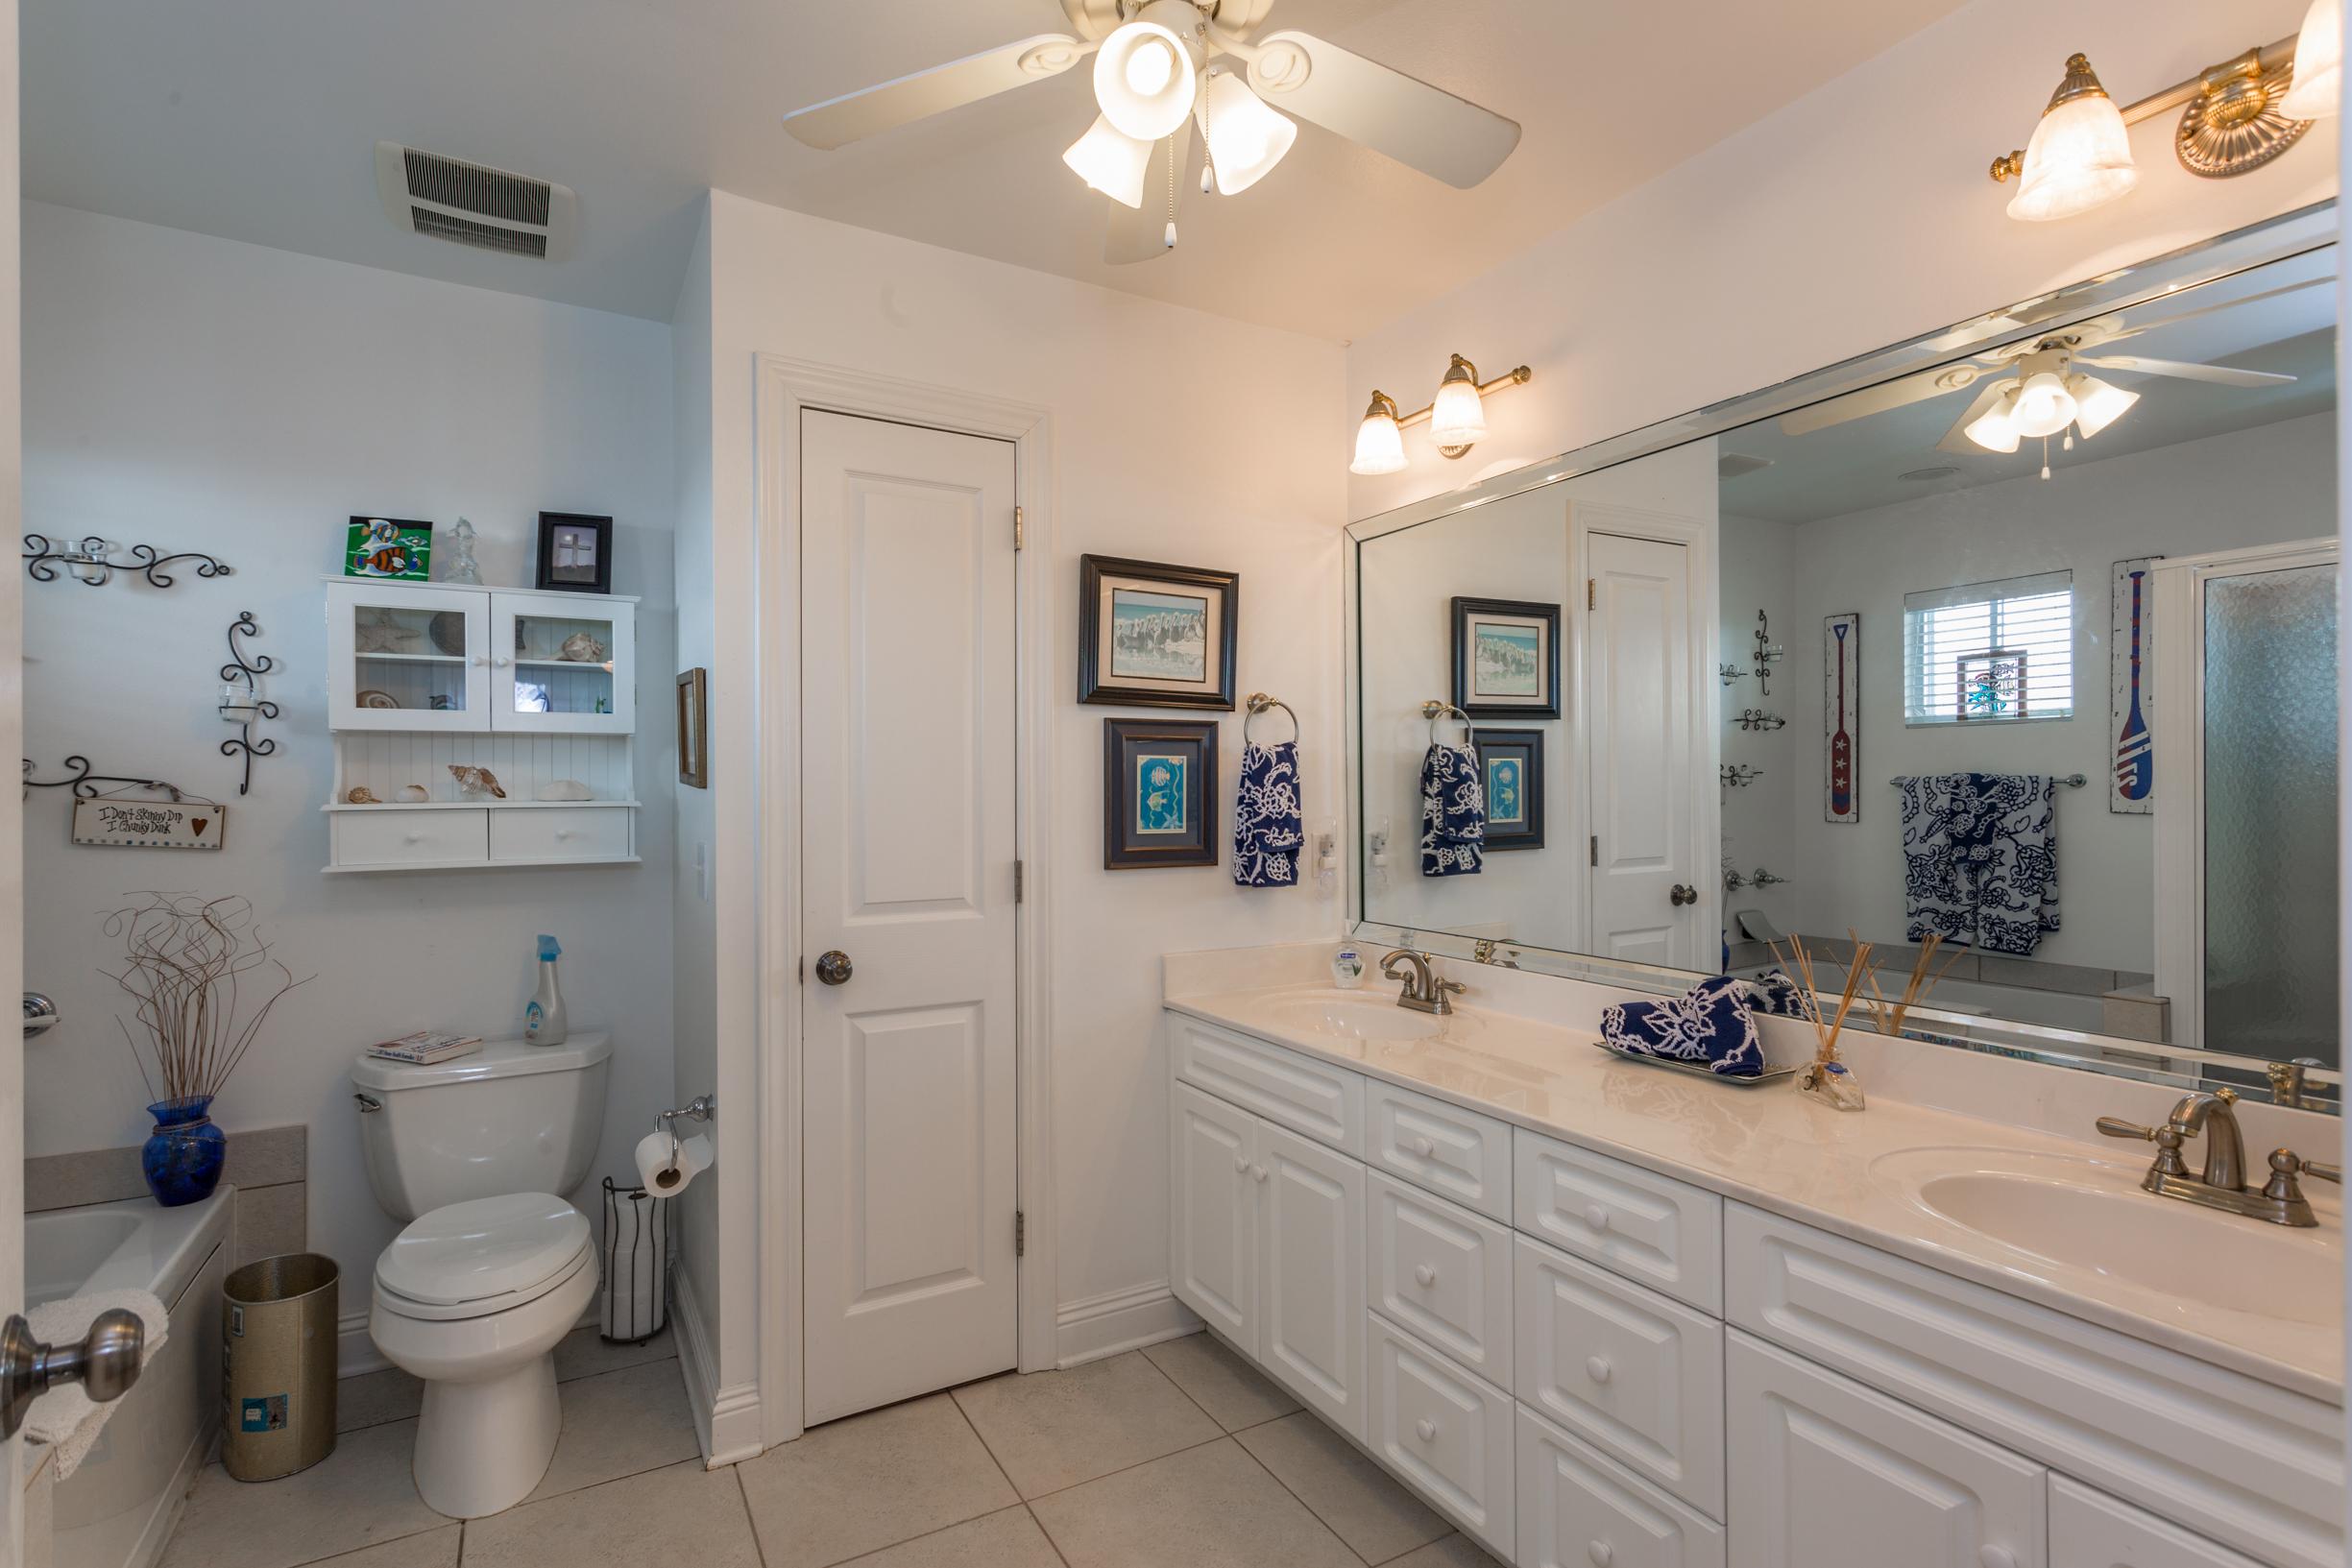 White Sands Cottage 501 Life's a Beach House Townhouse rental in White Sands Pensacola Beach in Pensacola Beach Florida - #30